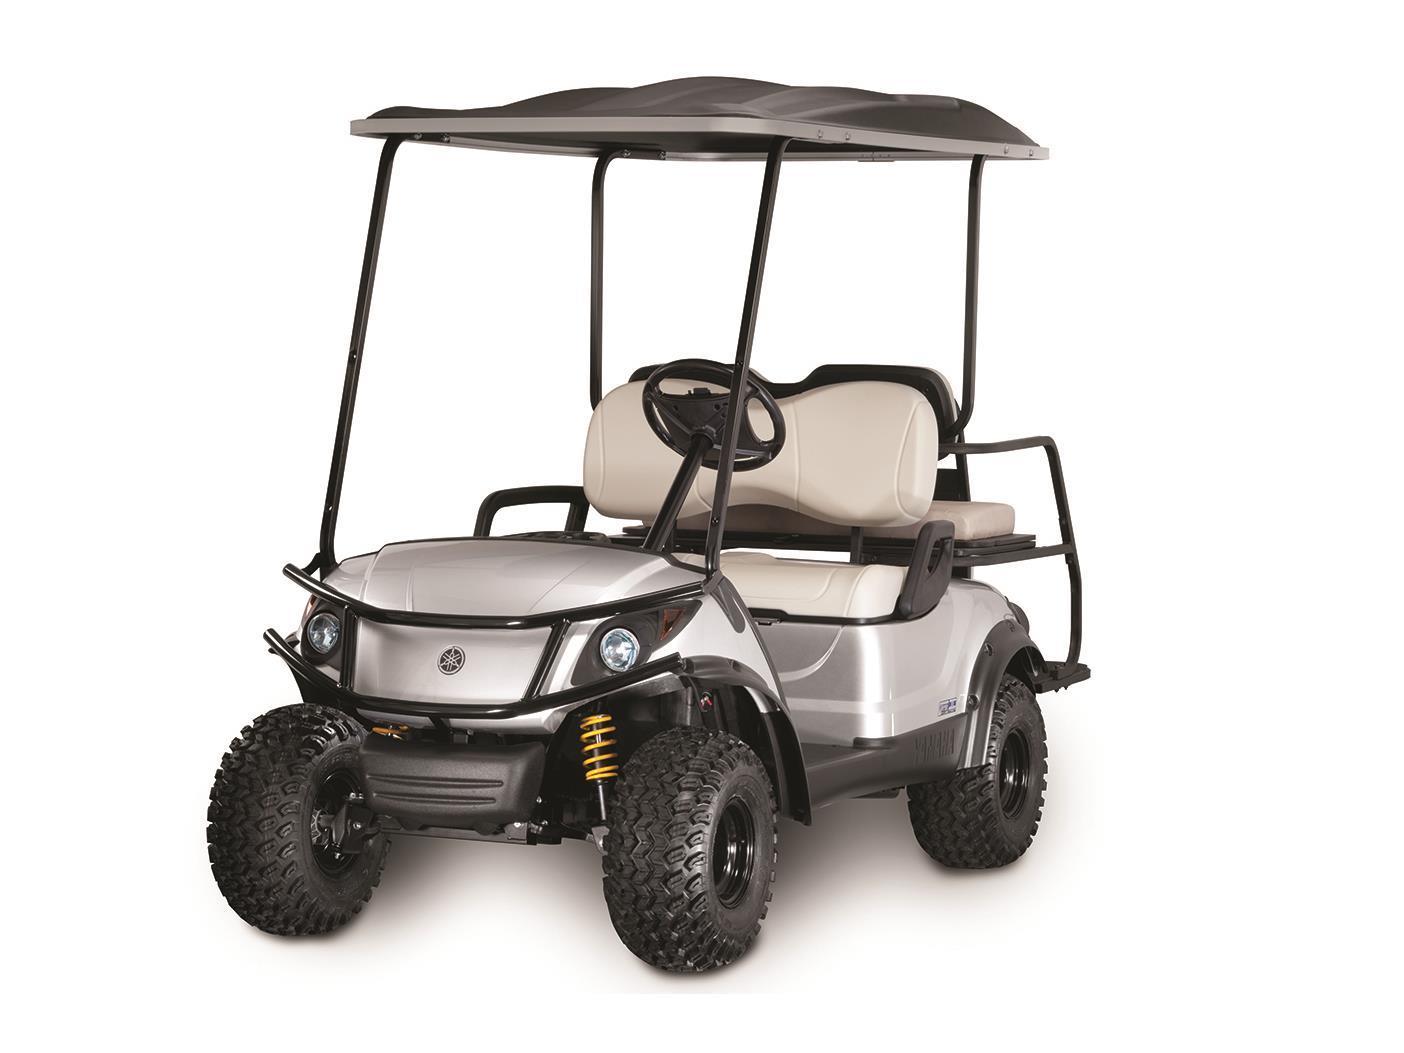 New England Golf Cars on yamaha golf cart models, yamaha golf cars, yamaha electric golf cart, yamaha golf cart repair manual, yamaha g29 golf cart, yamaha g11 golf cart, 2000 yamaha golf cart, 1995 yamaha golf cart, yamaha golf cart enclosures, yamaha g14 golf cart, identify yamaha golf cart, yamaha golf cart specifications, yamaha golf cart serial number, yamaha g8 golf cart, yamaha g4 golf cart, yamaha gas golf cart, yamaha g7 golf cart, yamaha golf cart light kit, yamaha golf cart wiring diagram, yamaha g22 golf cart,